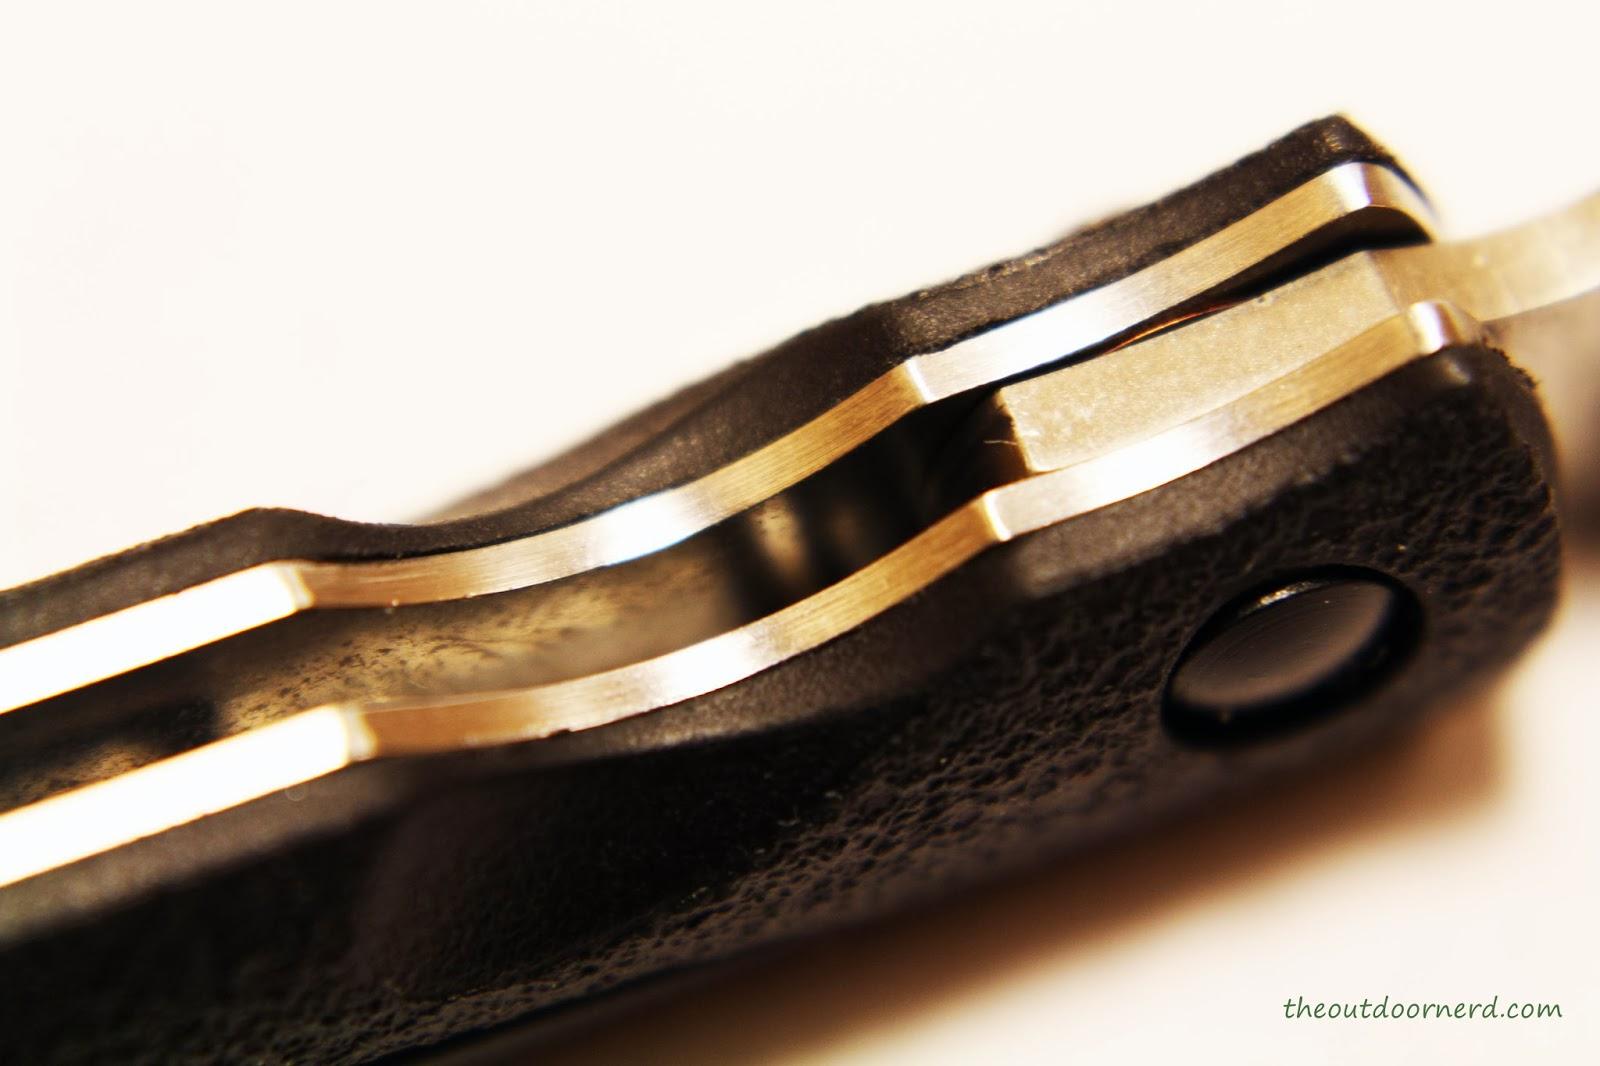 SanRenMu ZB-681 Pocket Knife - Closeup Of Handle 3